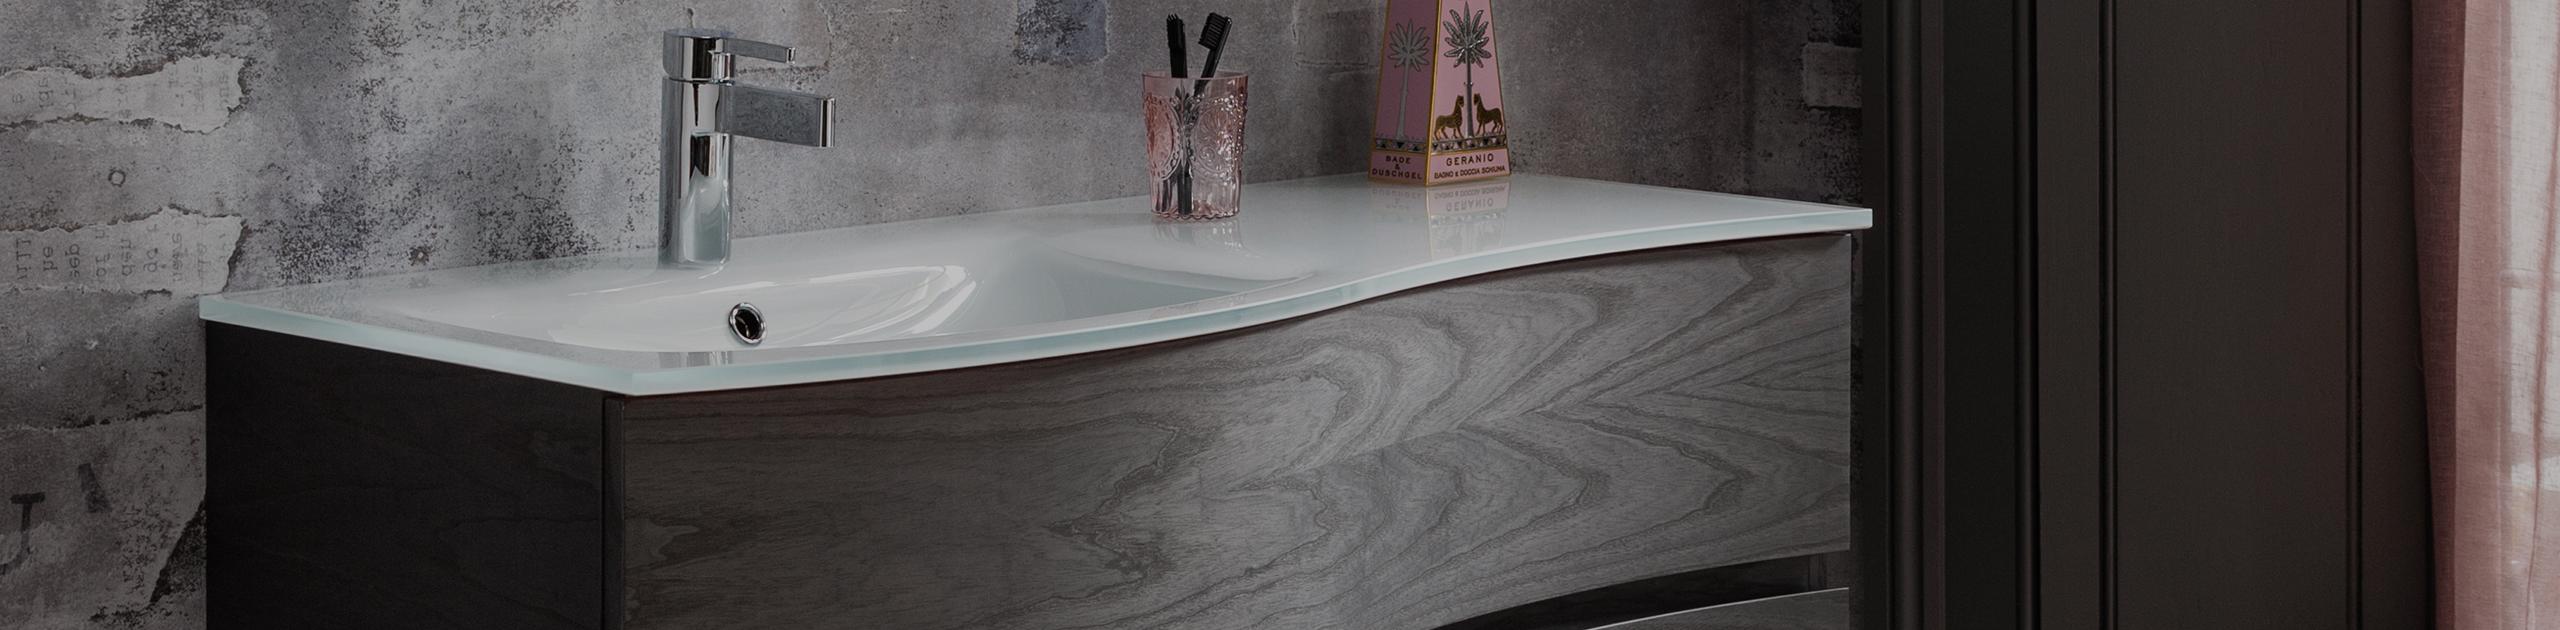 Svelte Bathroom Furniture